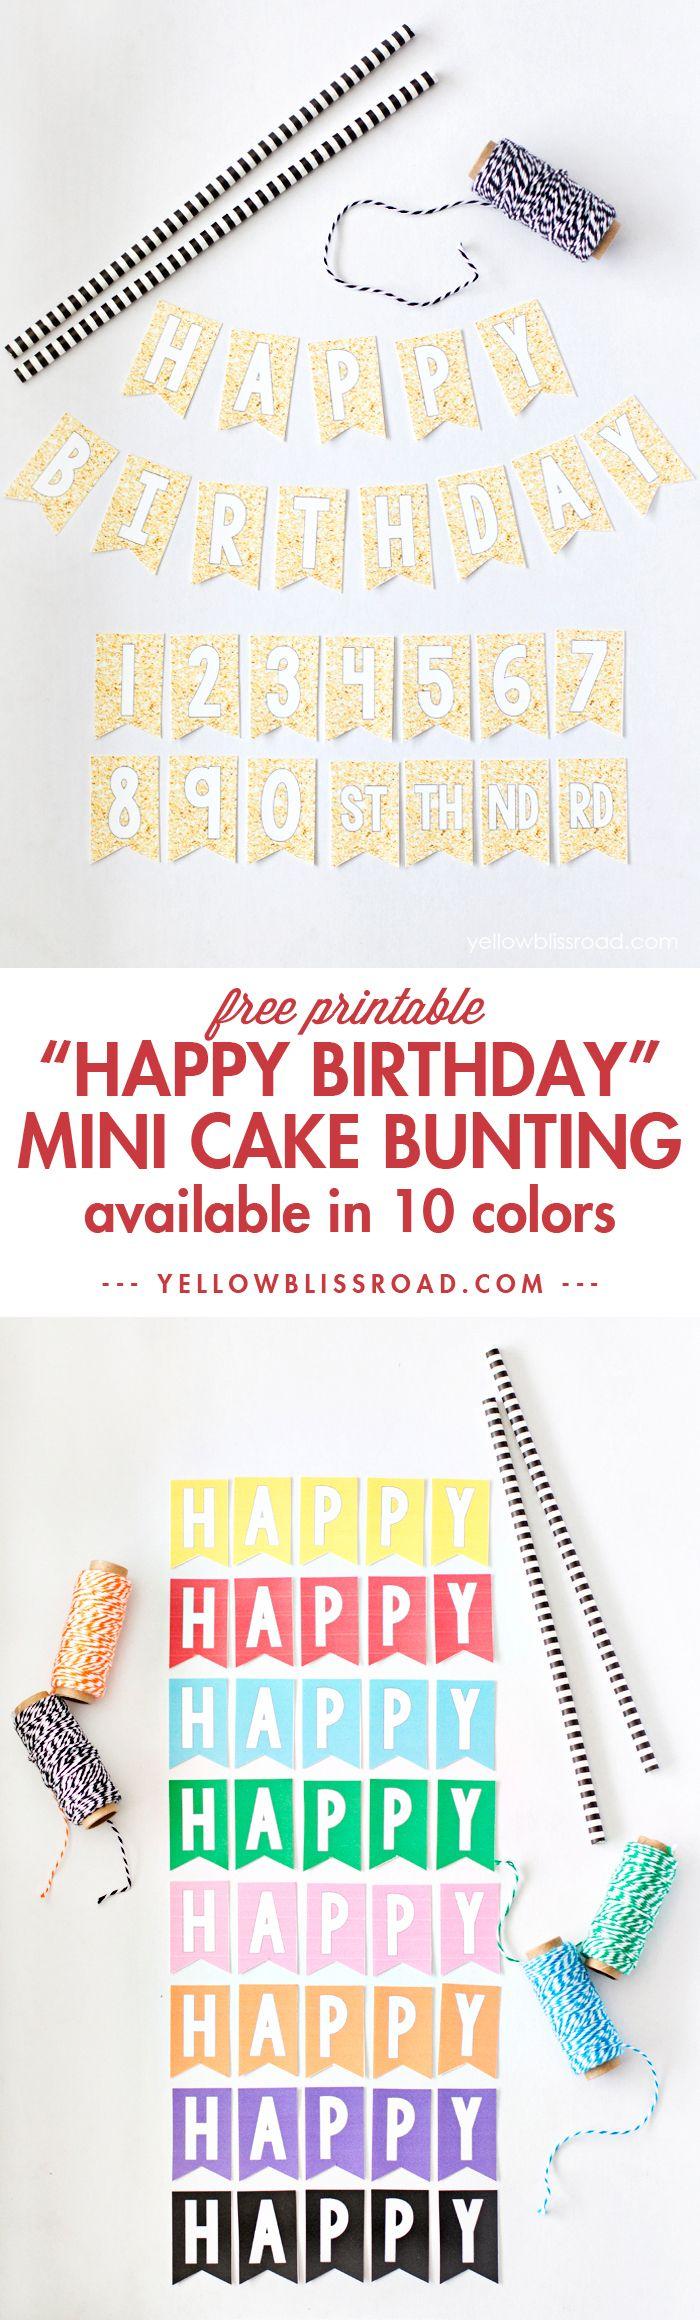 Free Printable Mini Birthday Bunting